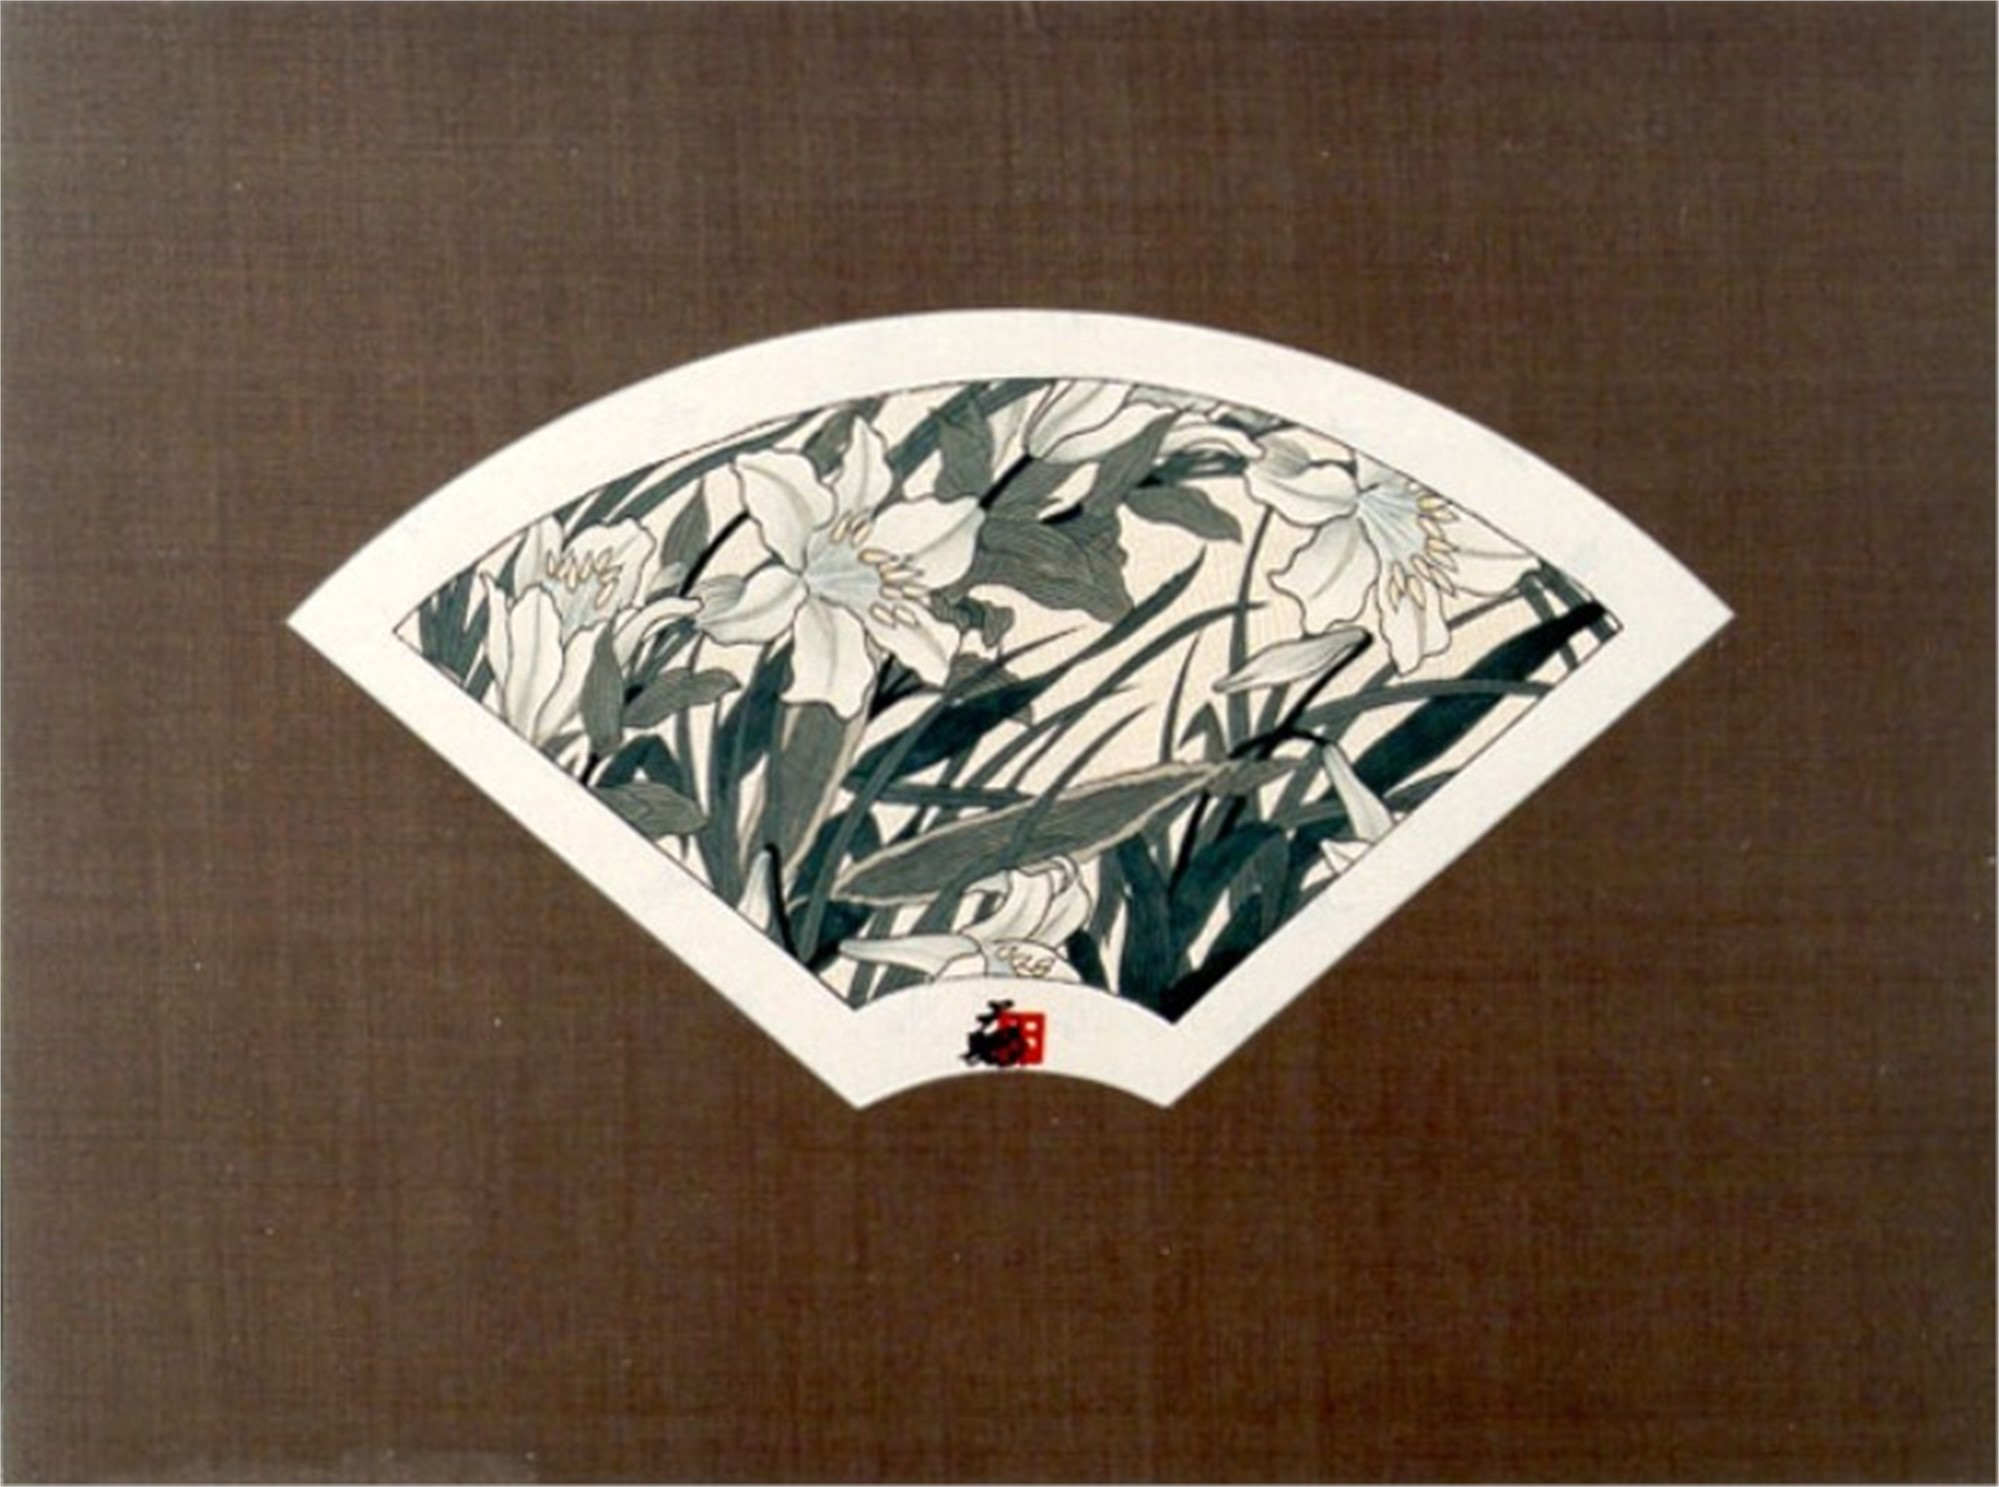 Fan - Silver Lilies by Hisashi Otsuka